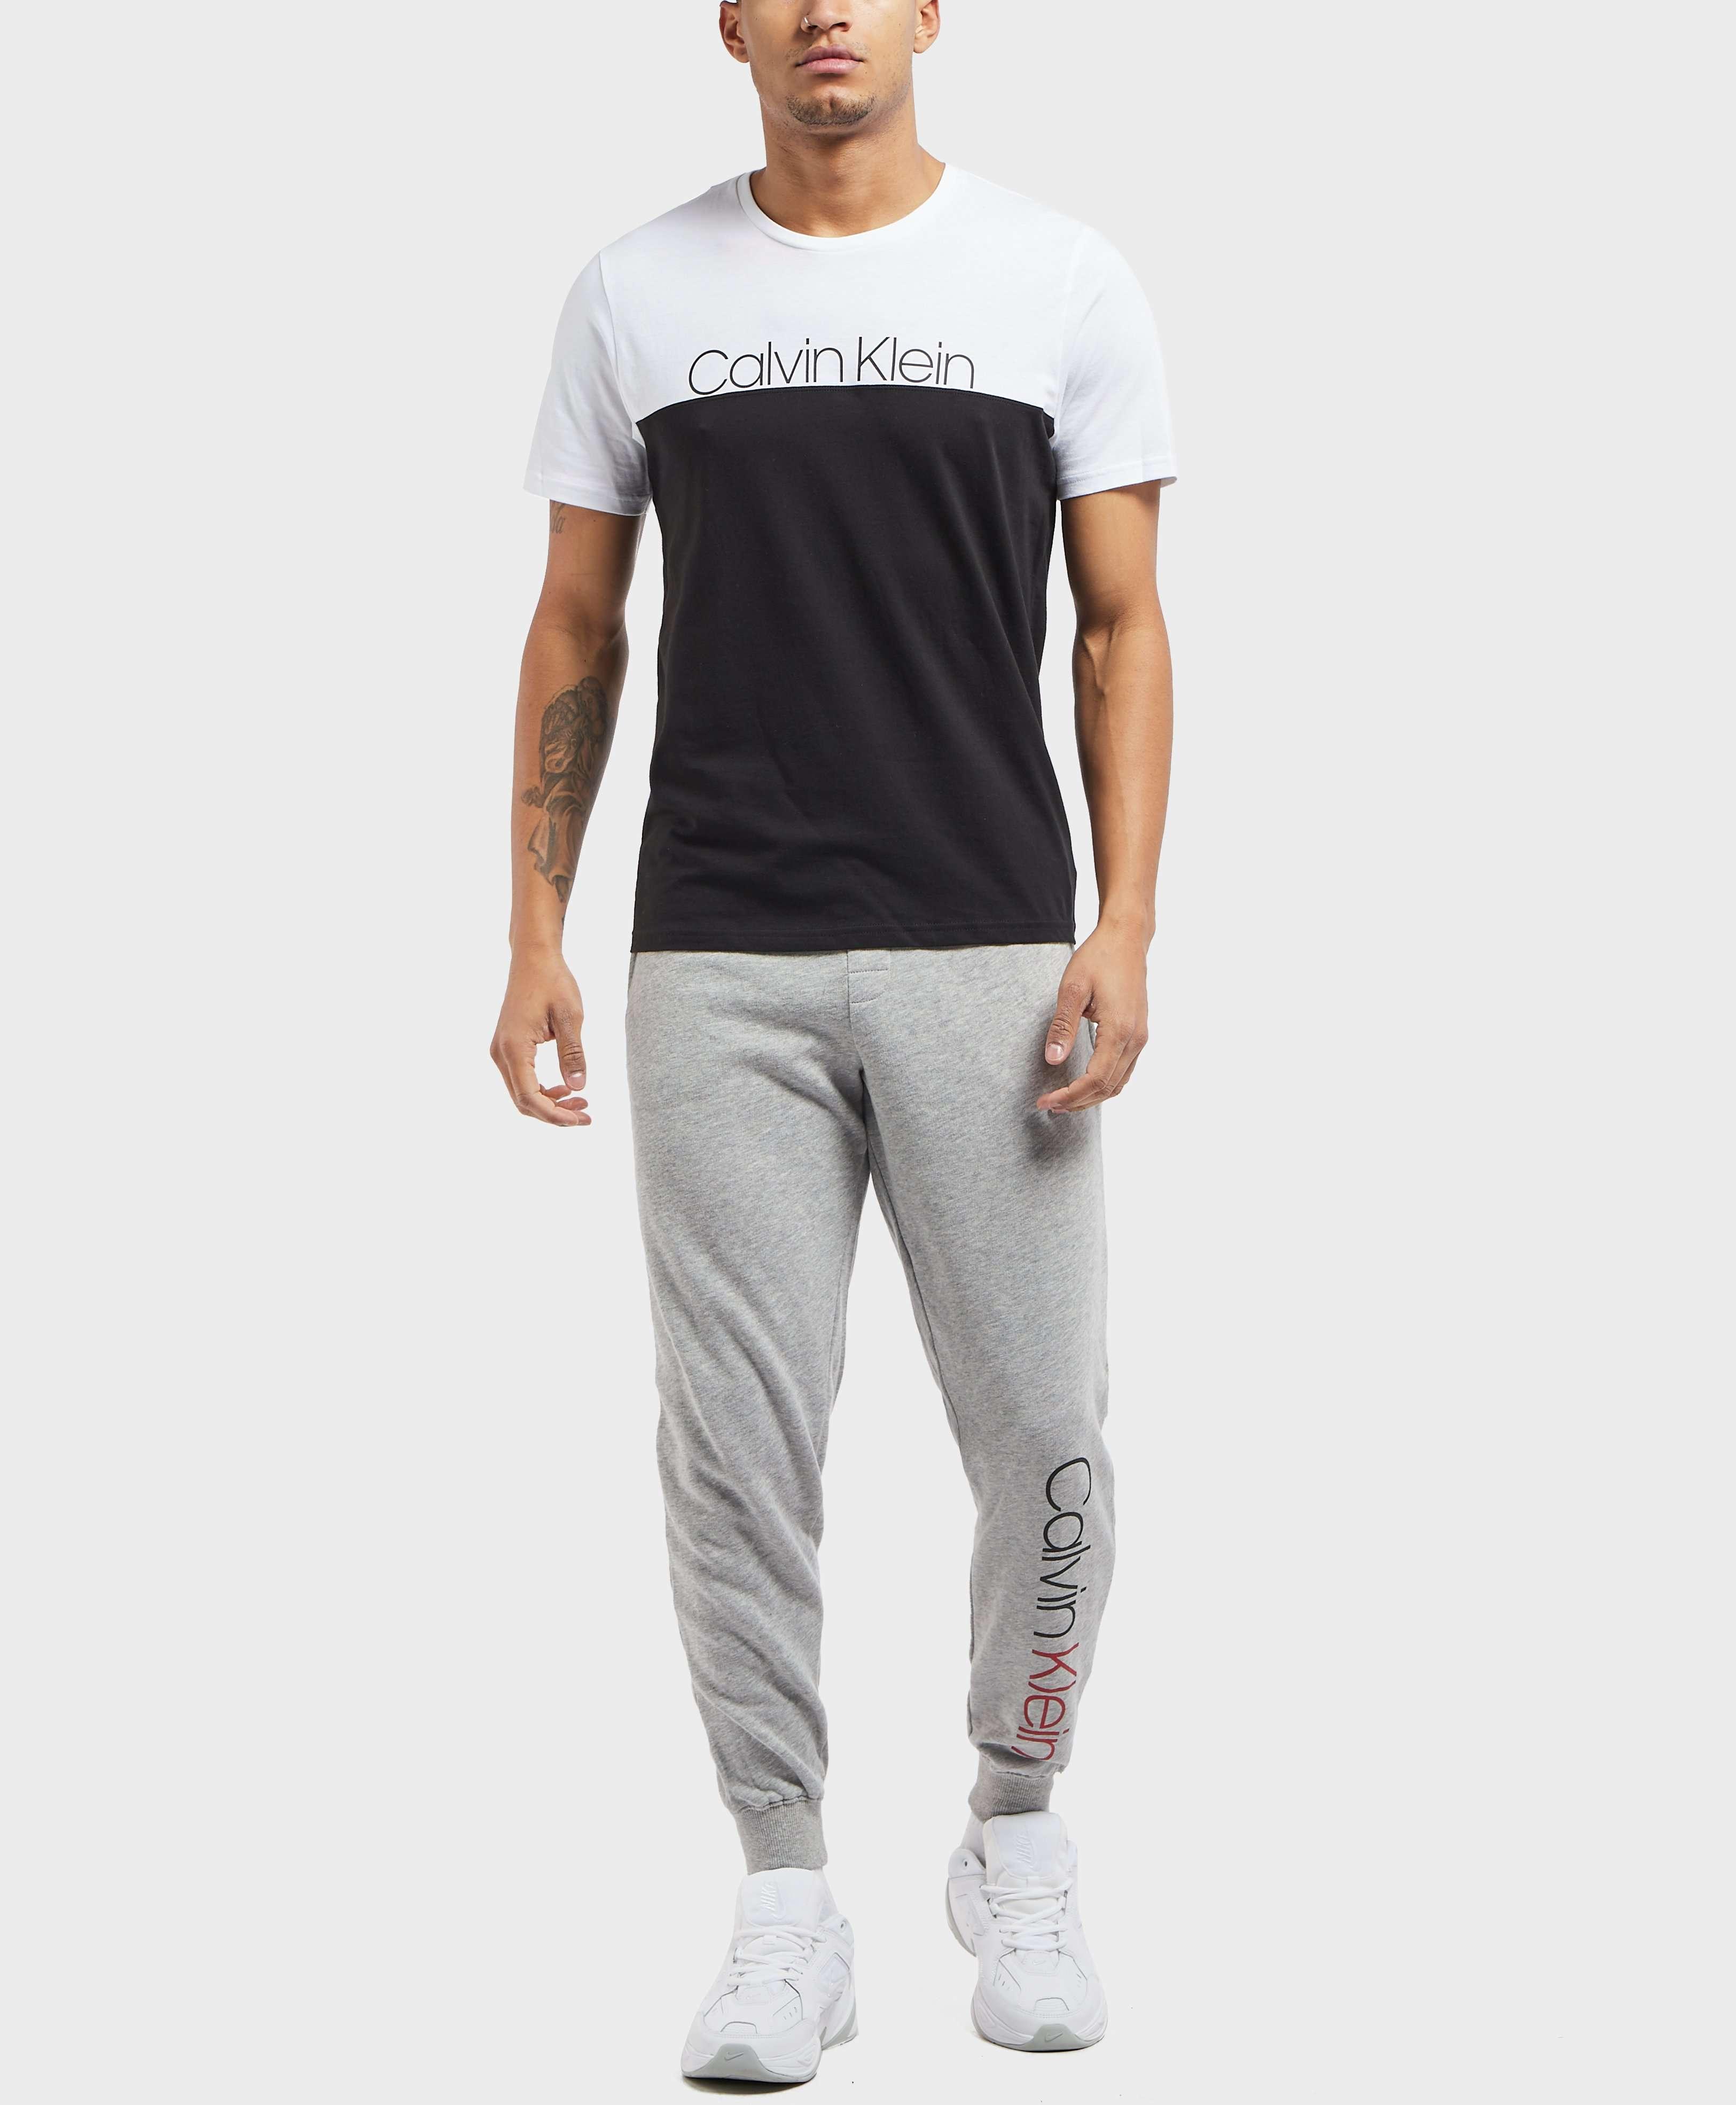 Calvin Klein Split Logo Cuffed Fleece Pants